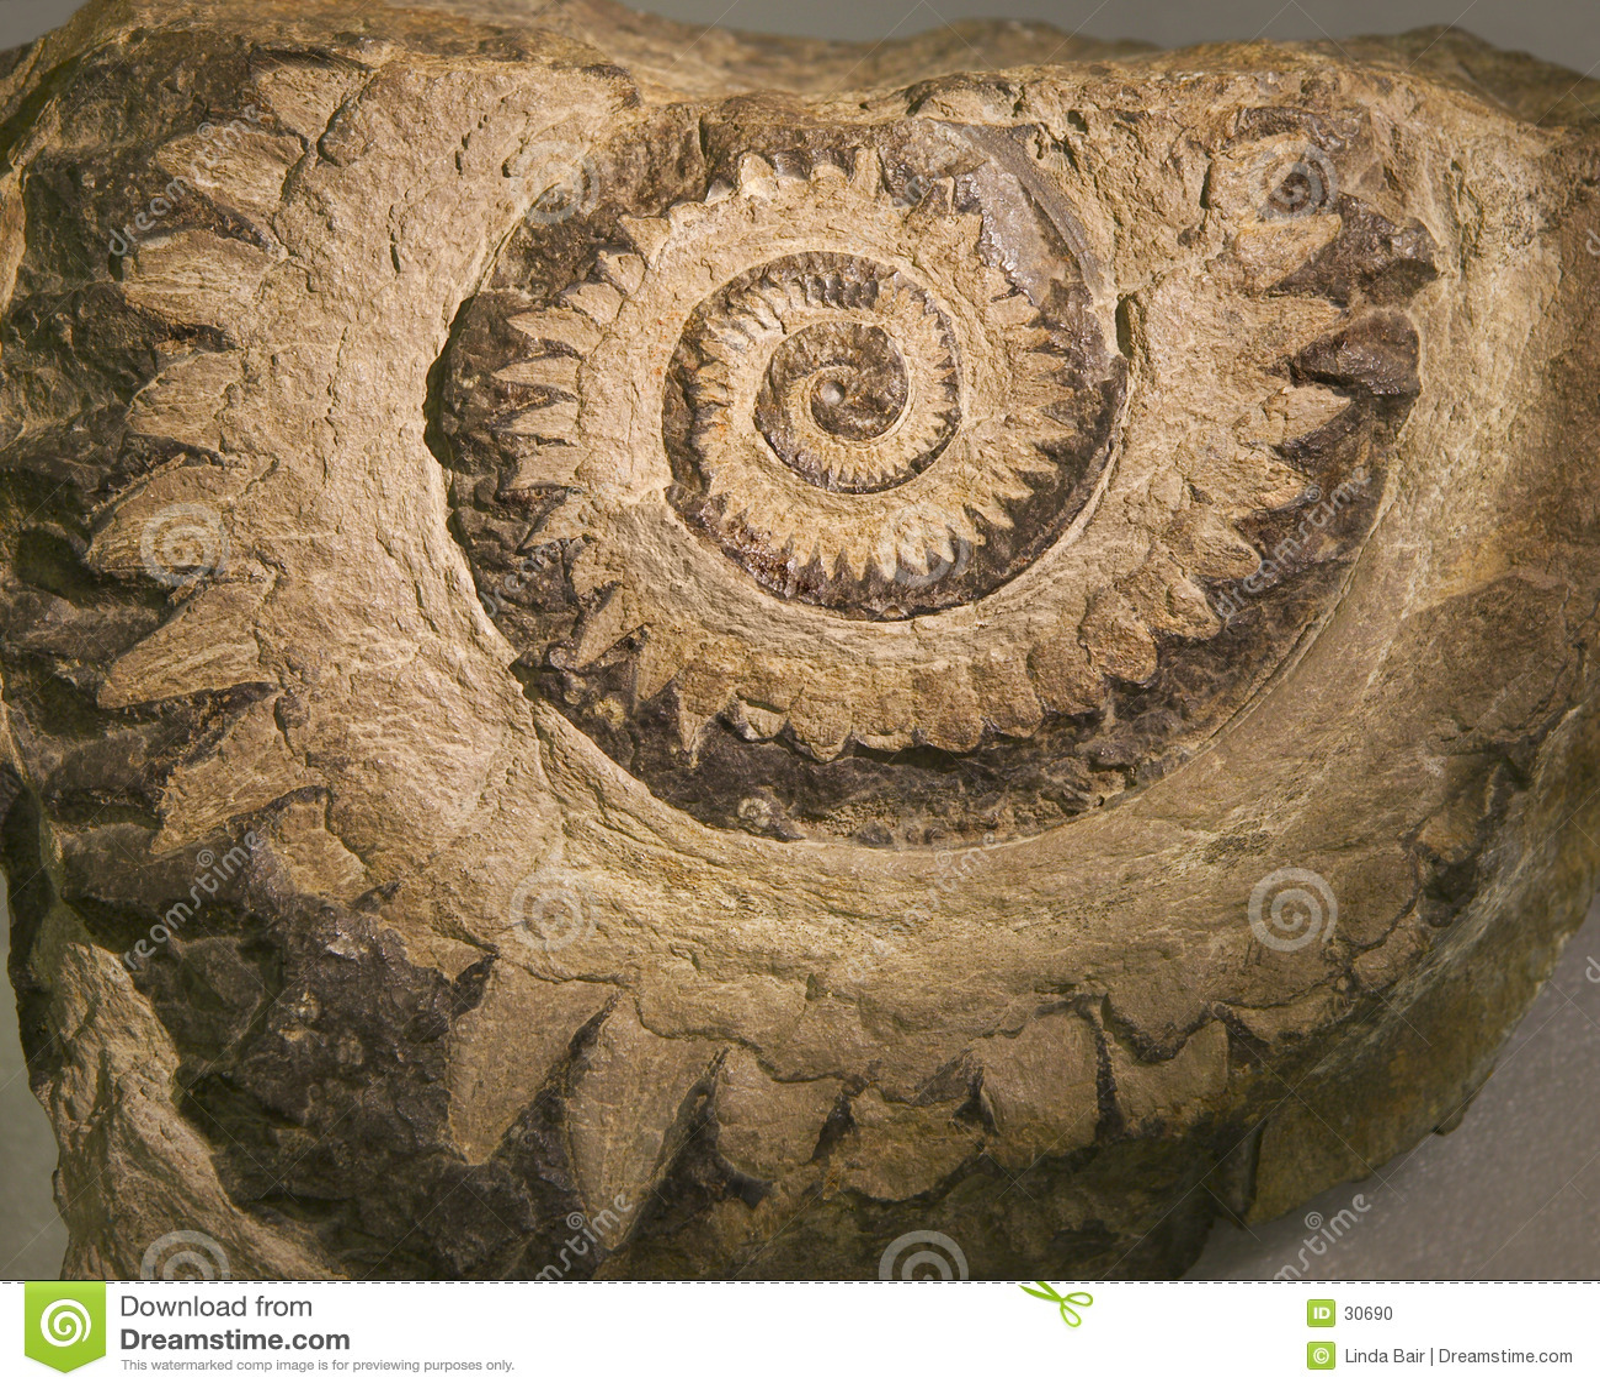 Fossil ?des Summens sah? Zahn-Haifisch